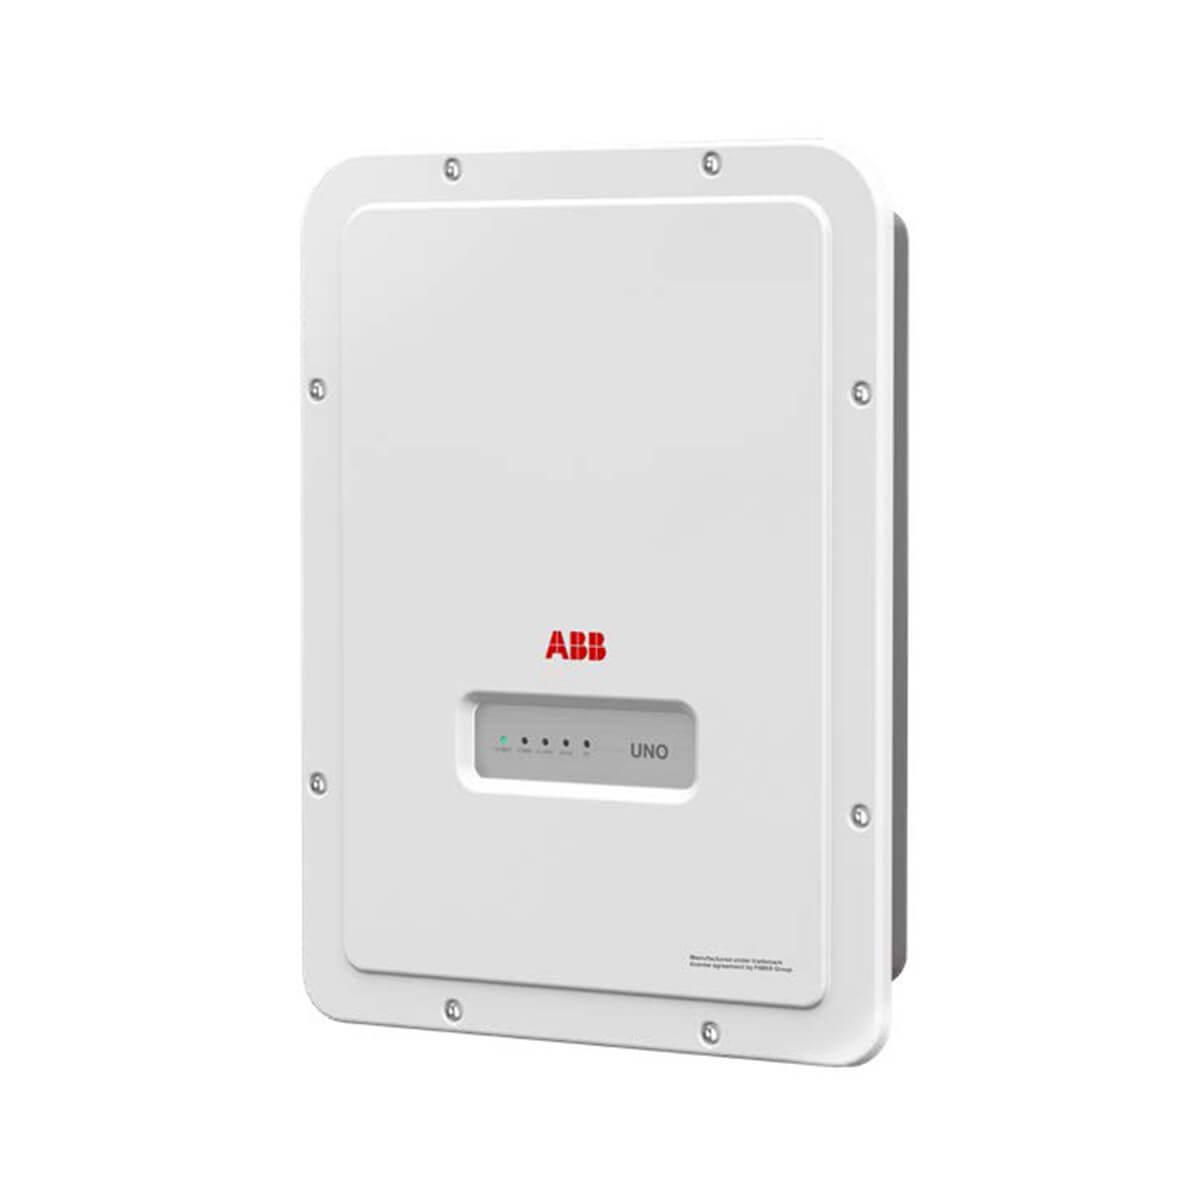 abb fimer 4.6kW inverter, abb fimer uno-dm 4.6kW inverter, abb fimer uno-dm-4.6-tl-plus-q inverter, abb fimer uno-dm-4.6-tl-plus-q, abb fimer uno-dm 4.6 kW, ABB FIMER 4.6 KW